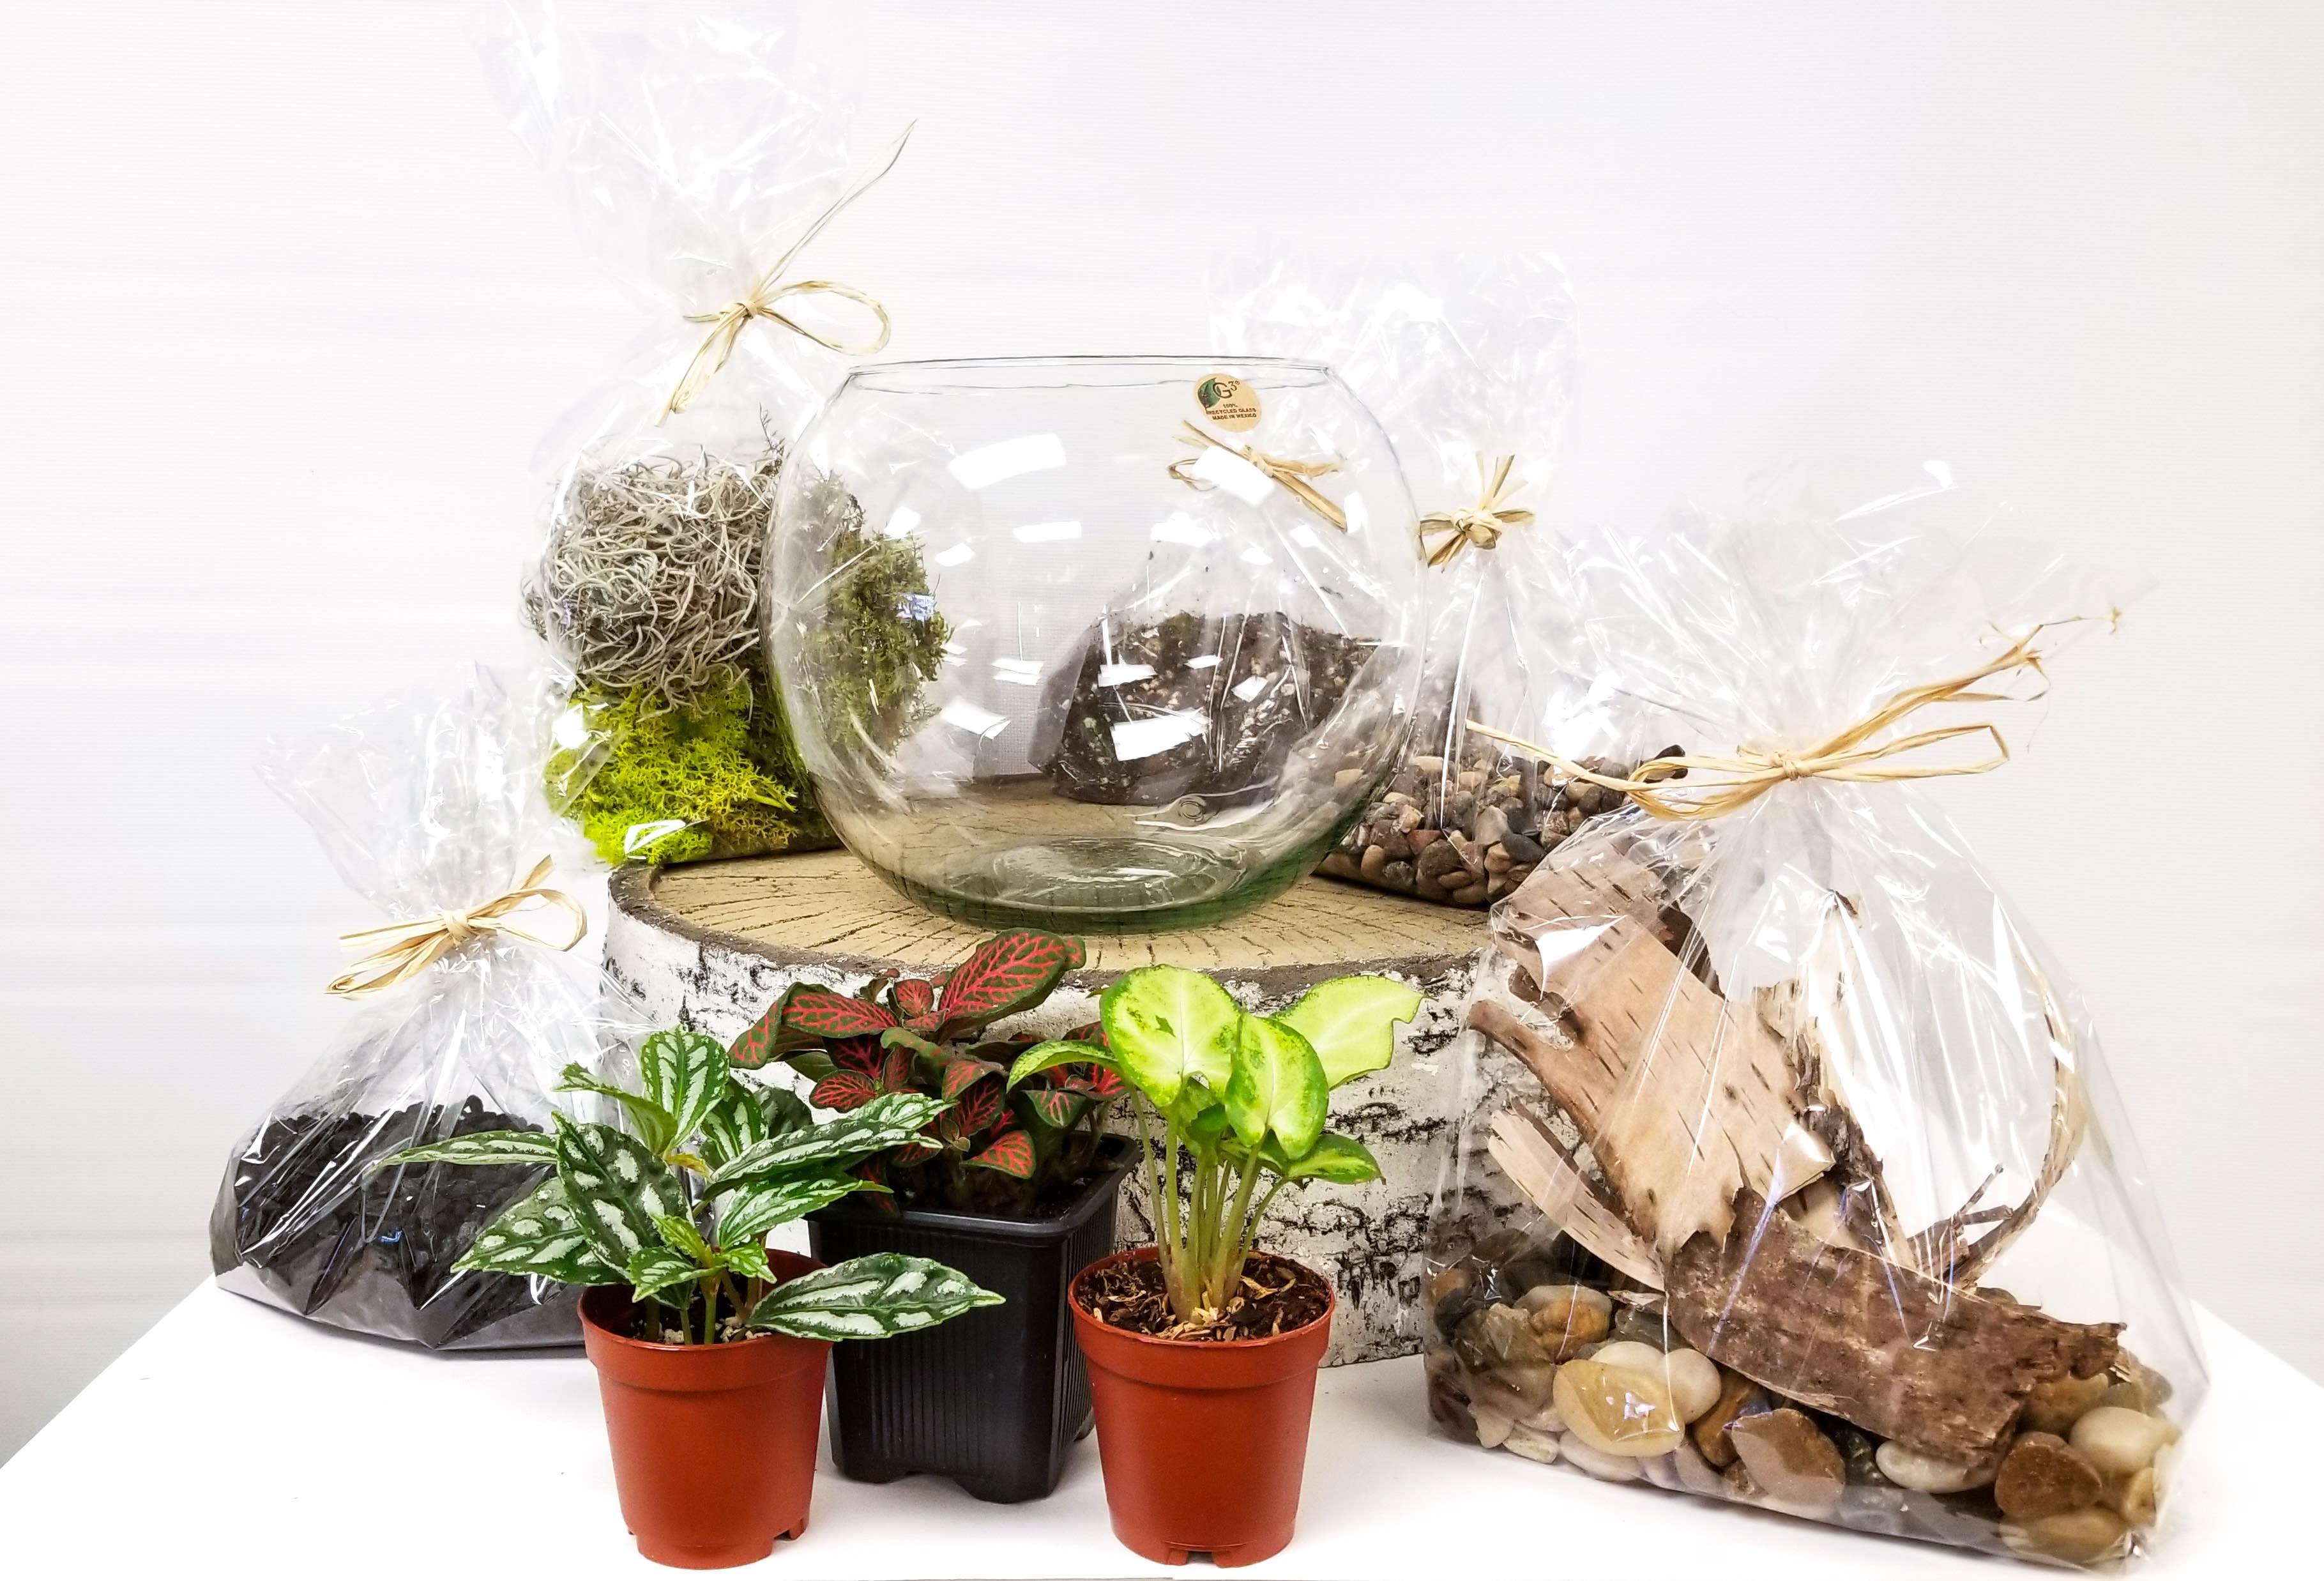 Diy Tropical Plant Terrarium Kit In St Paul Mn Your Enchanted Florist